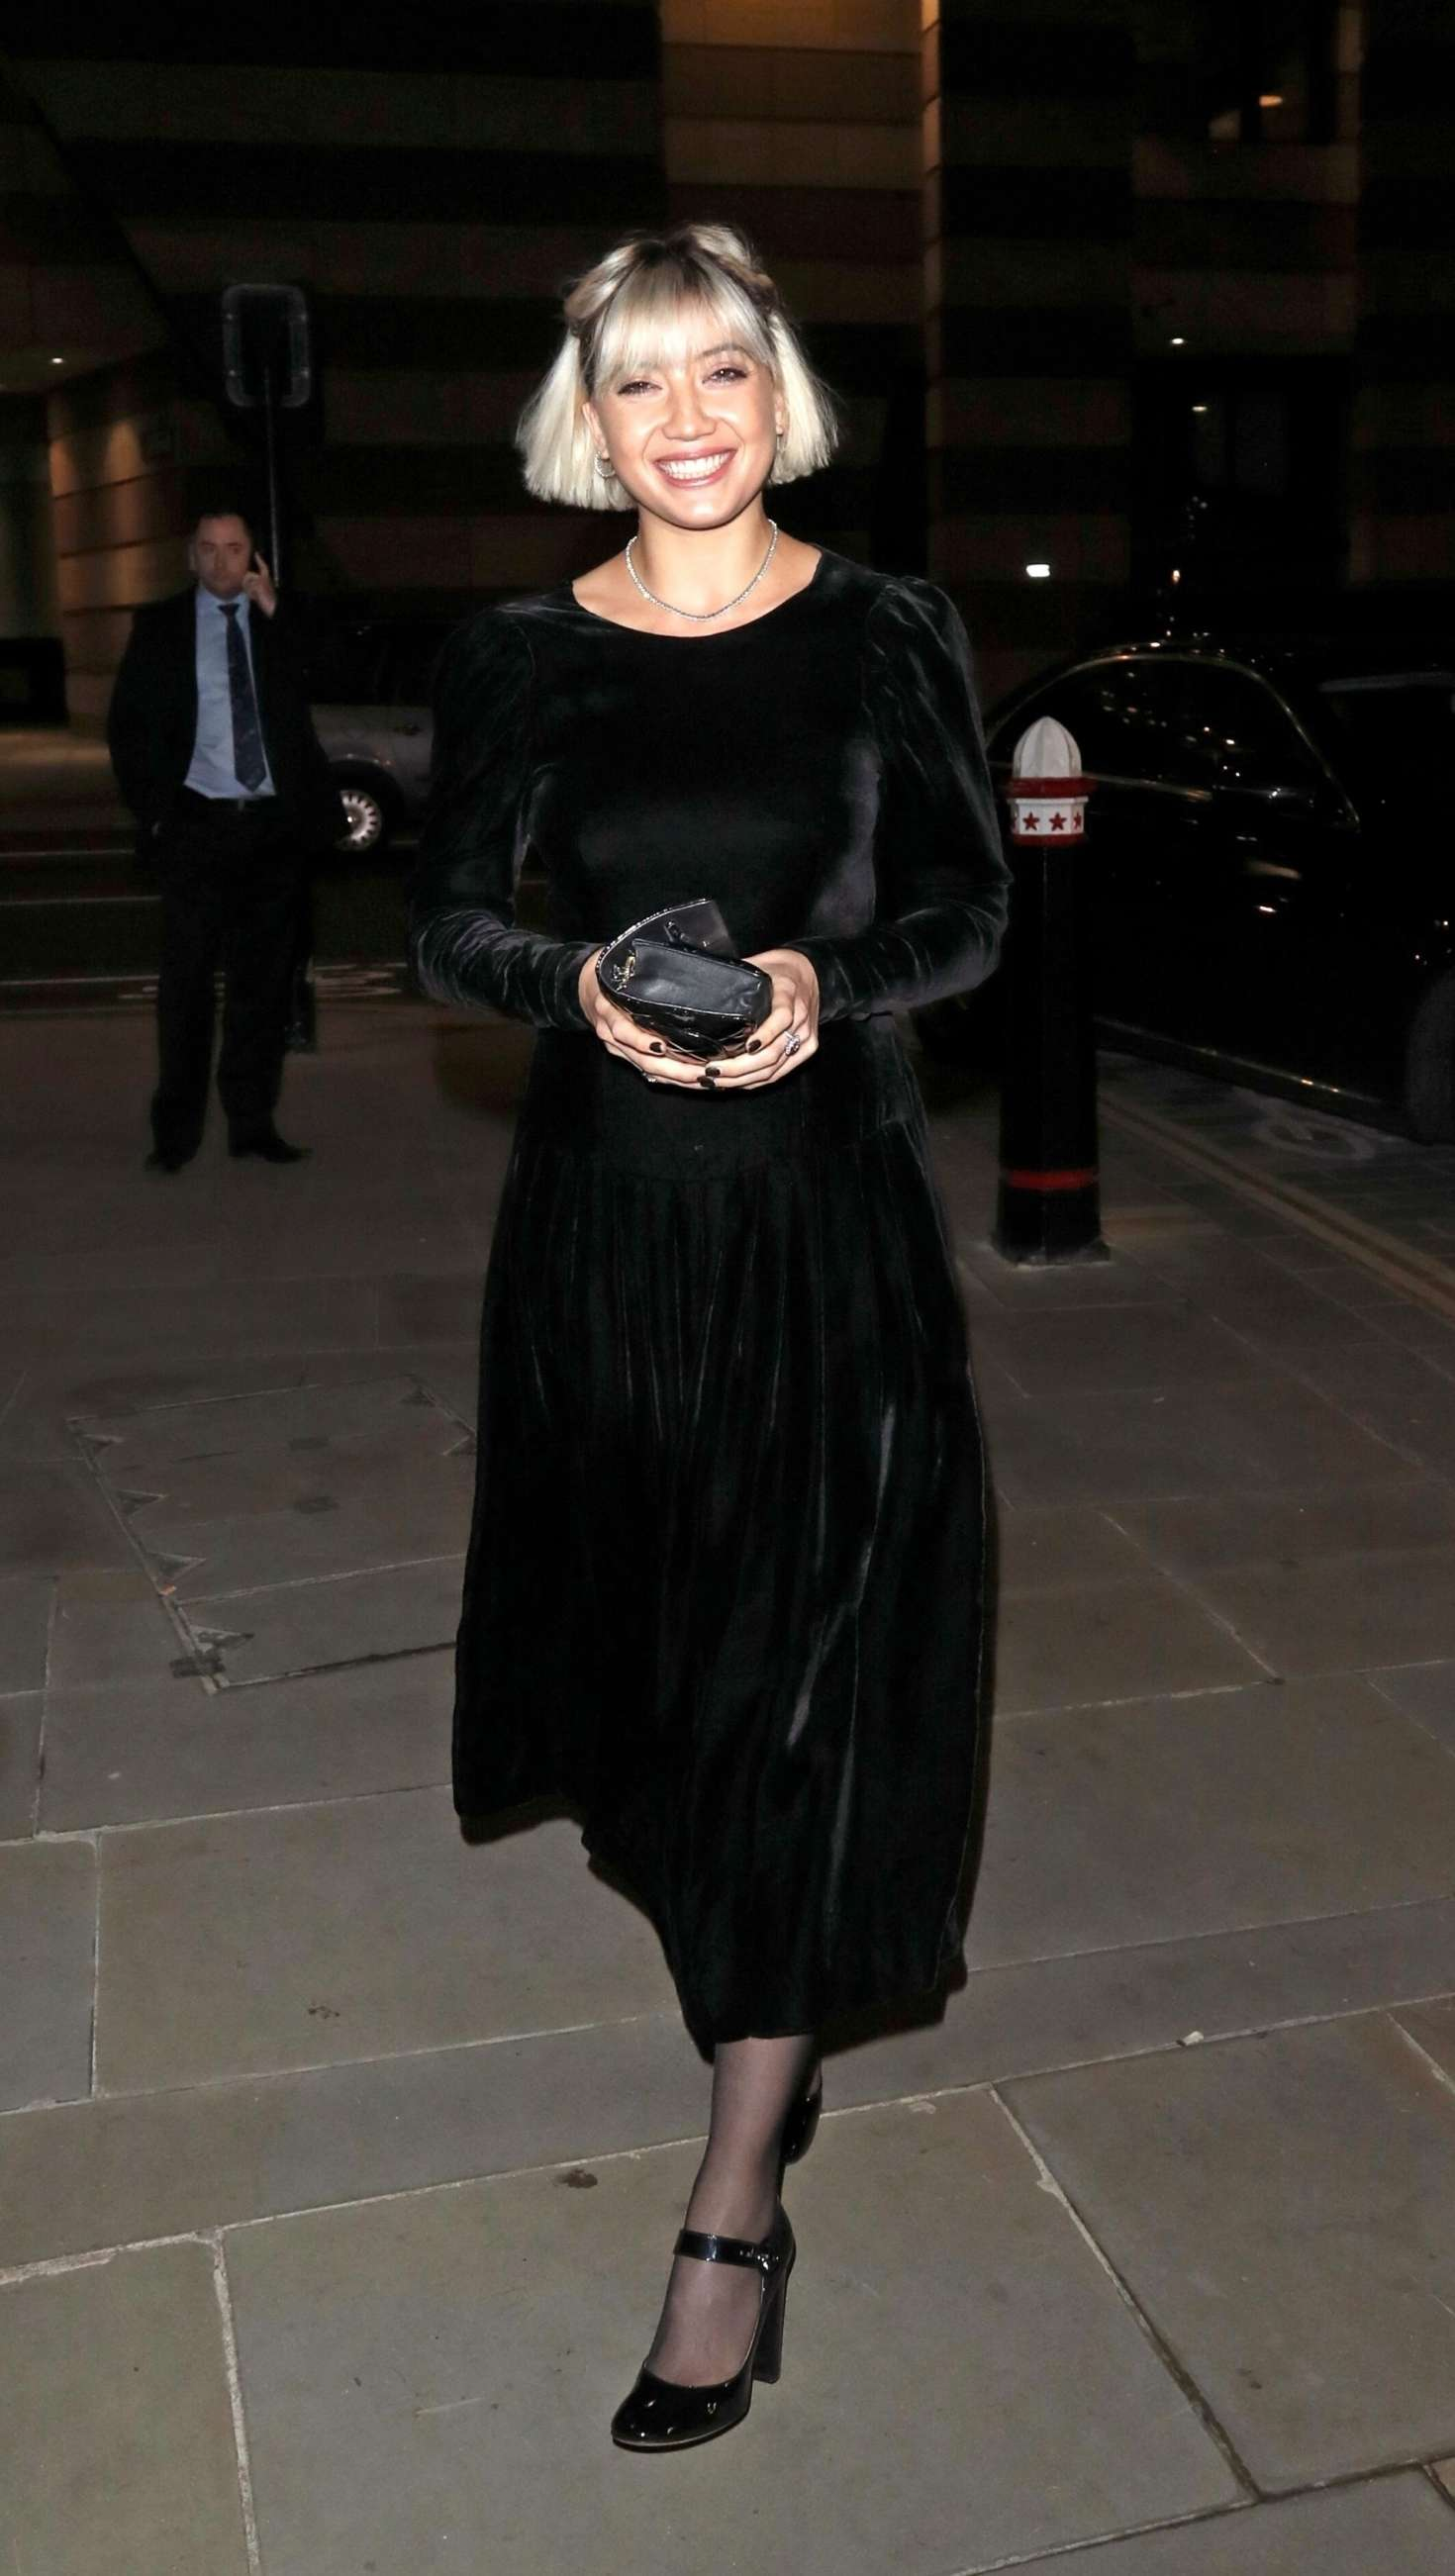 Daisy Lowe 2018 : Daisy Lowe: Vanity Fair x Bloomberg Climate Change Gala Dinner -02